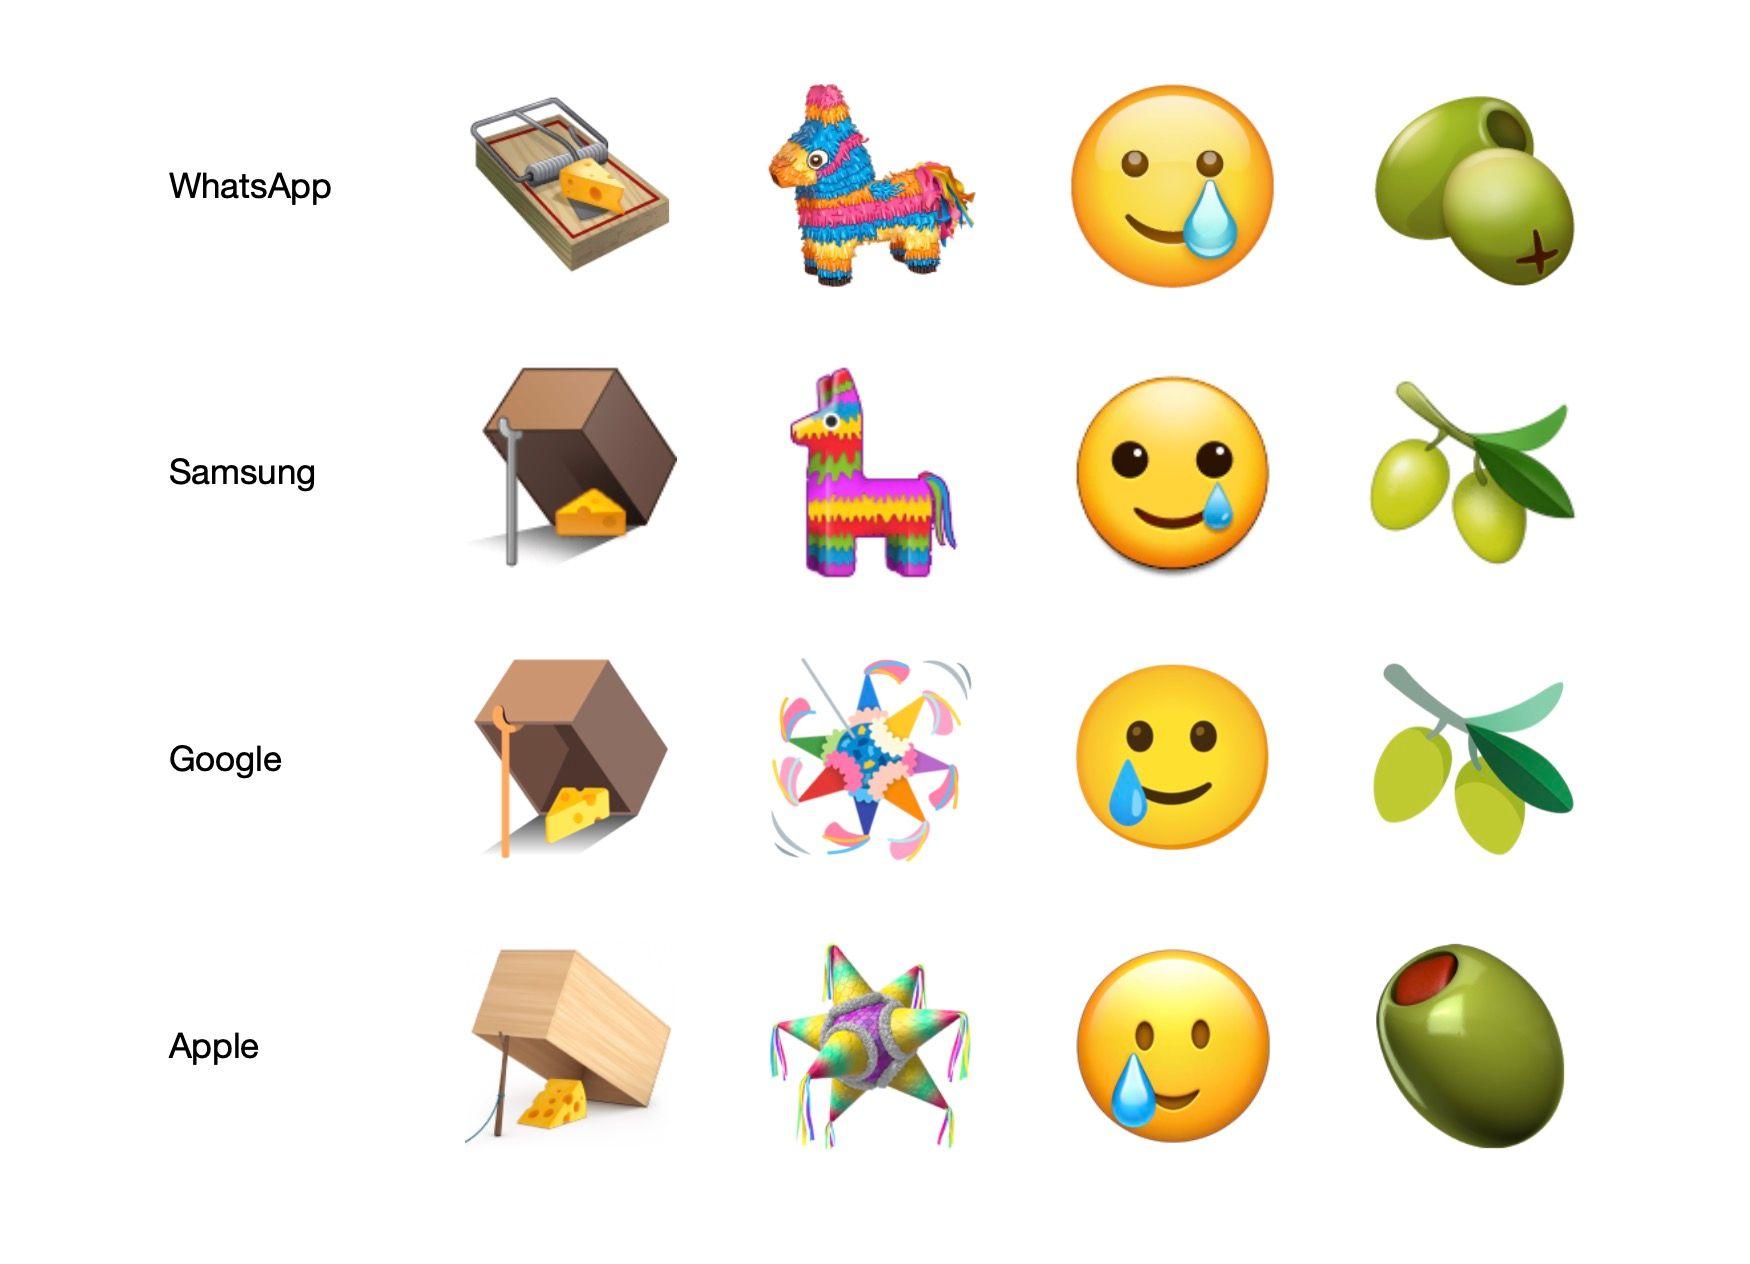 whatsapp-apple-google-samsung-emoji-comparison